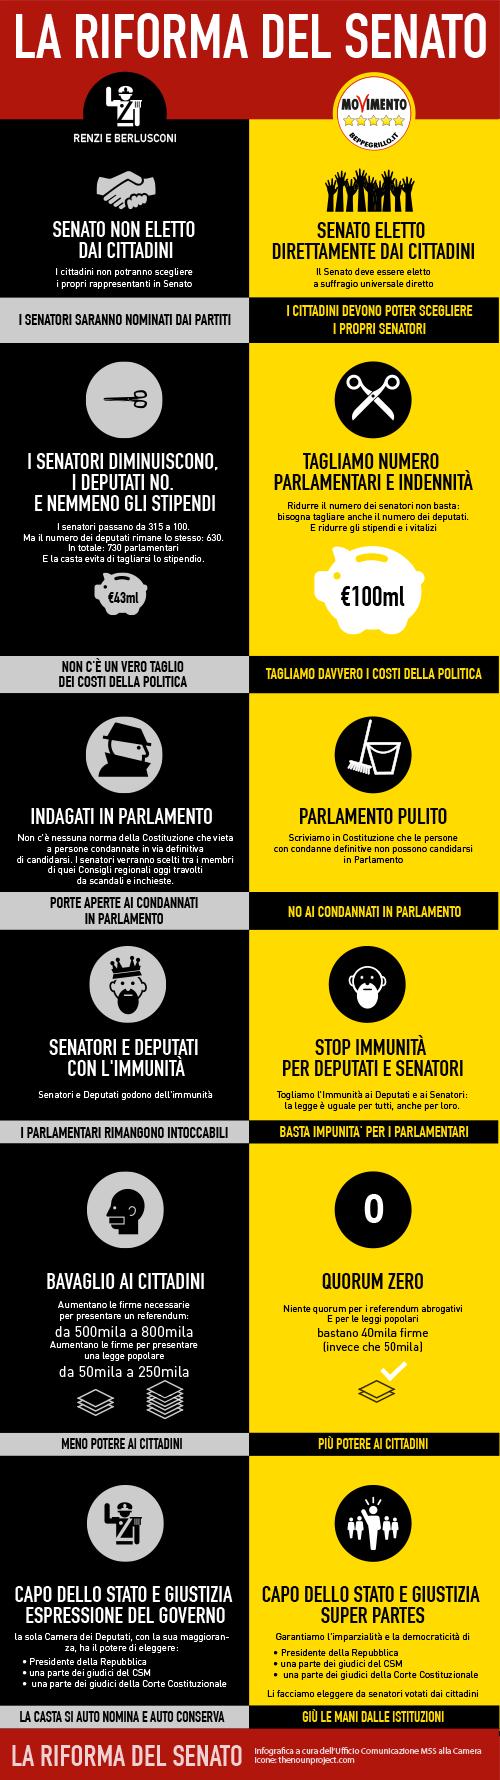 infografica_riforma_senato1